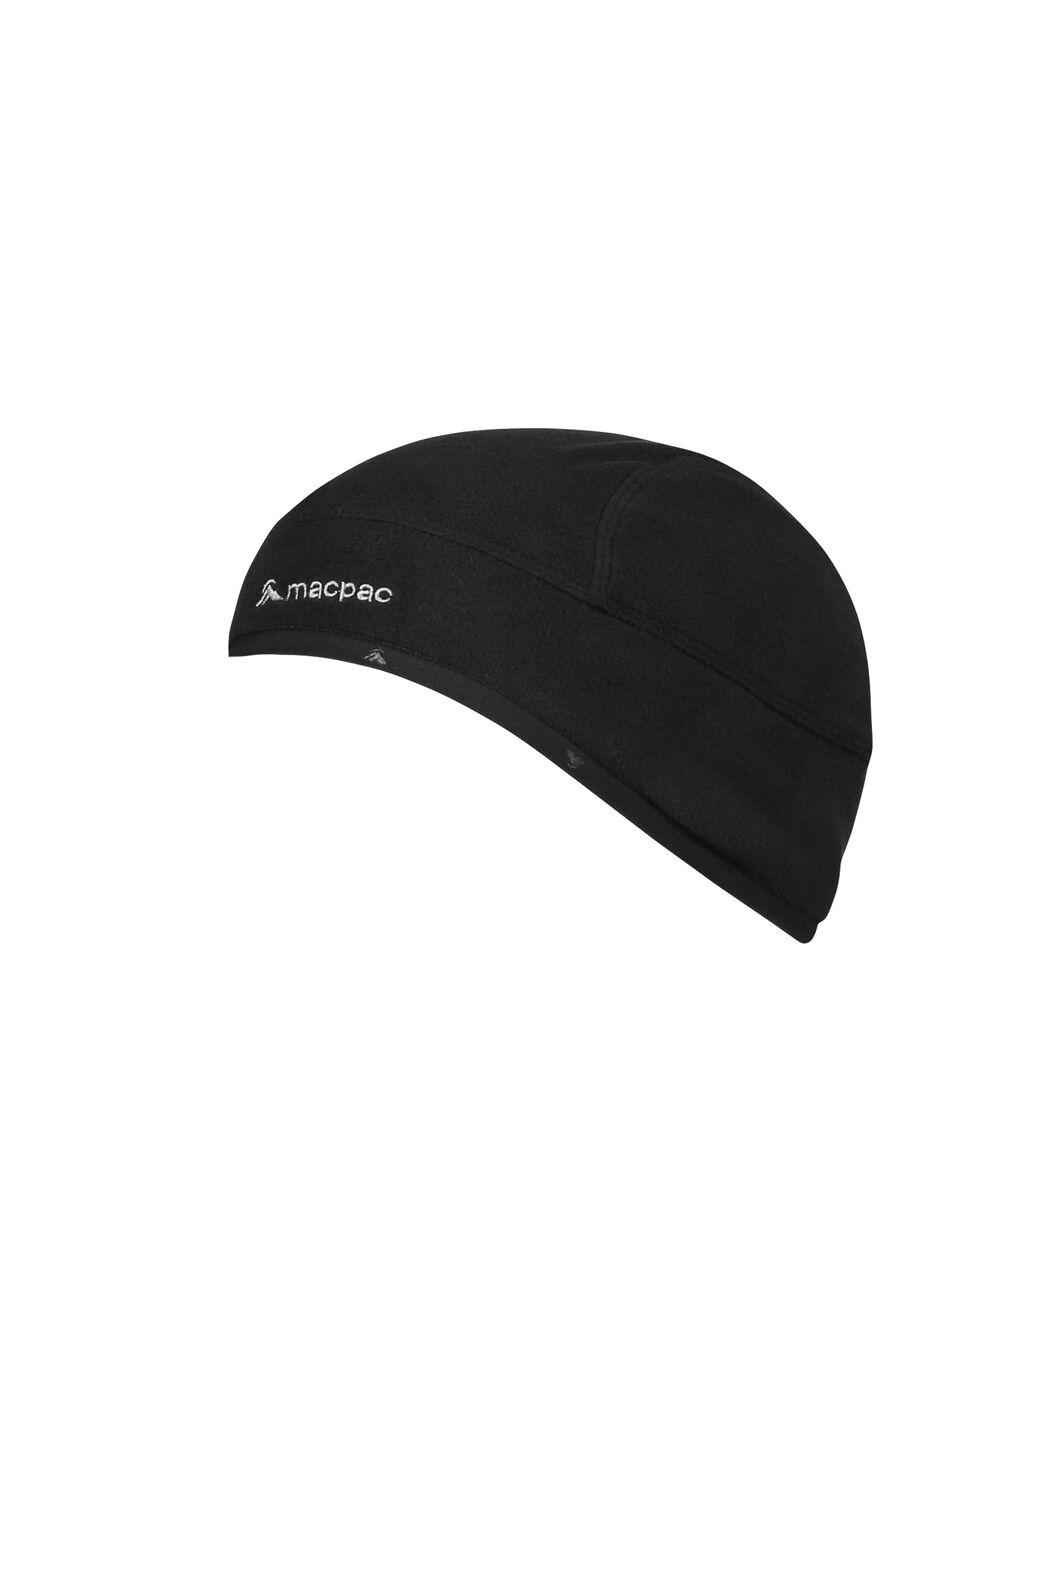 Macpac Hothed Fleece BeanieV3, Black, hi-res